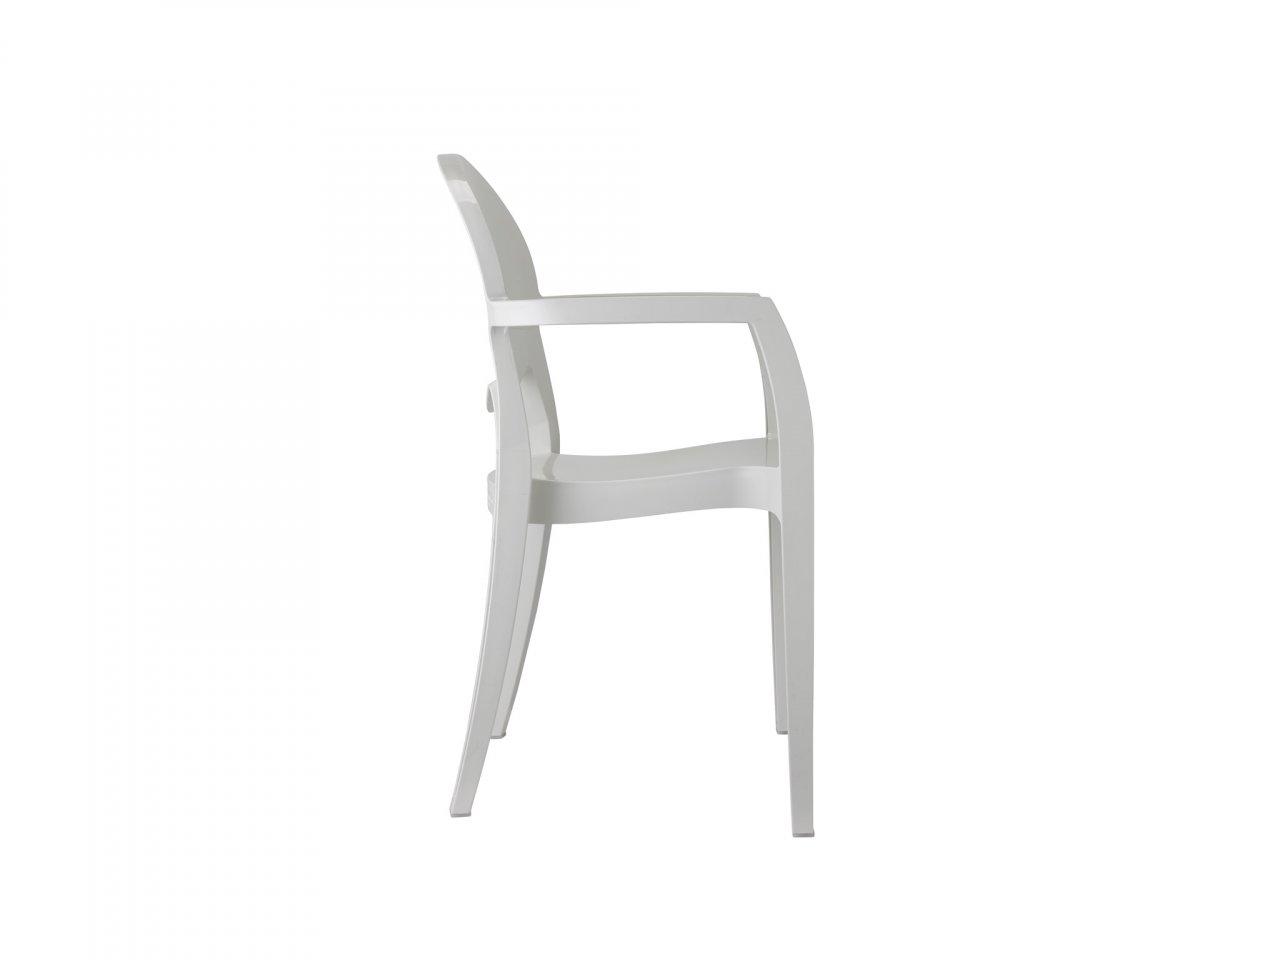 Sedia Con Braccioli Igloo Tecnopolimero - v3